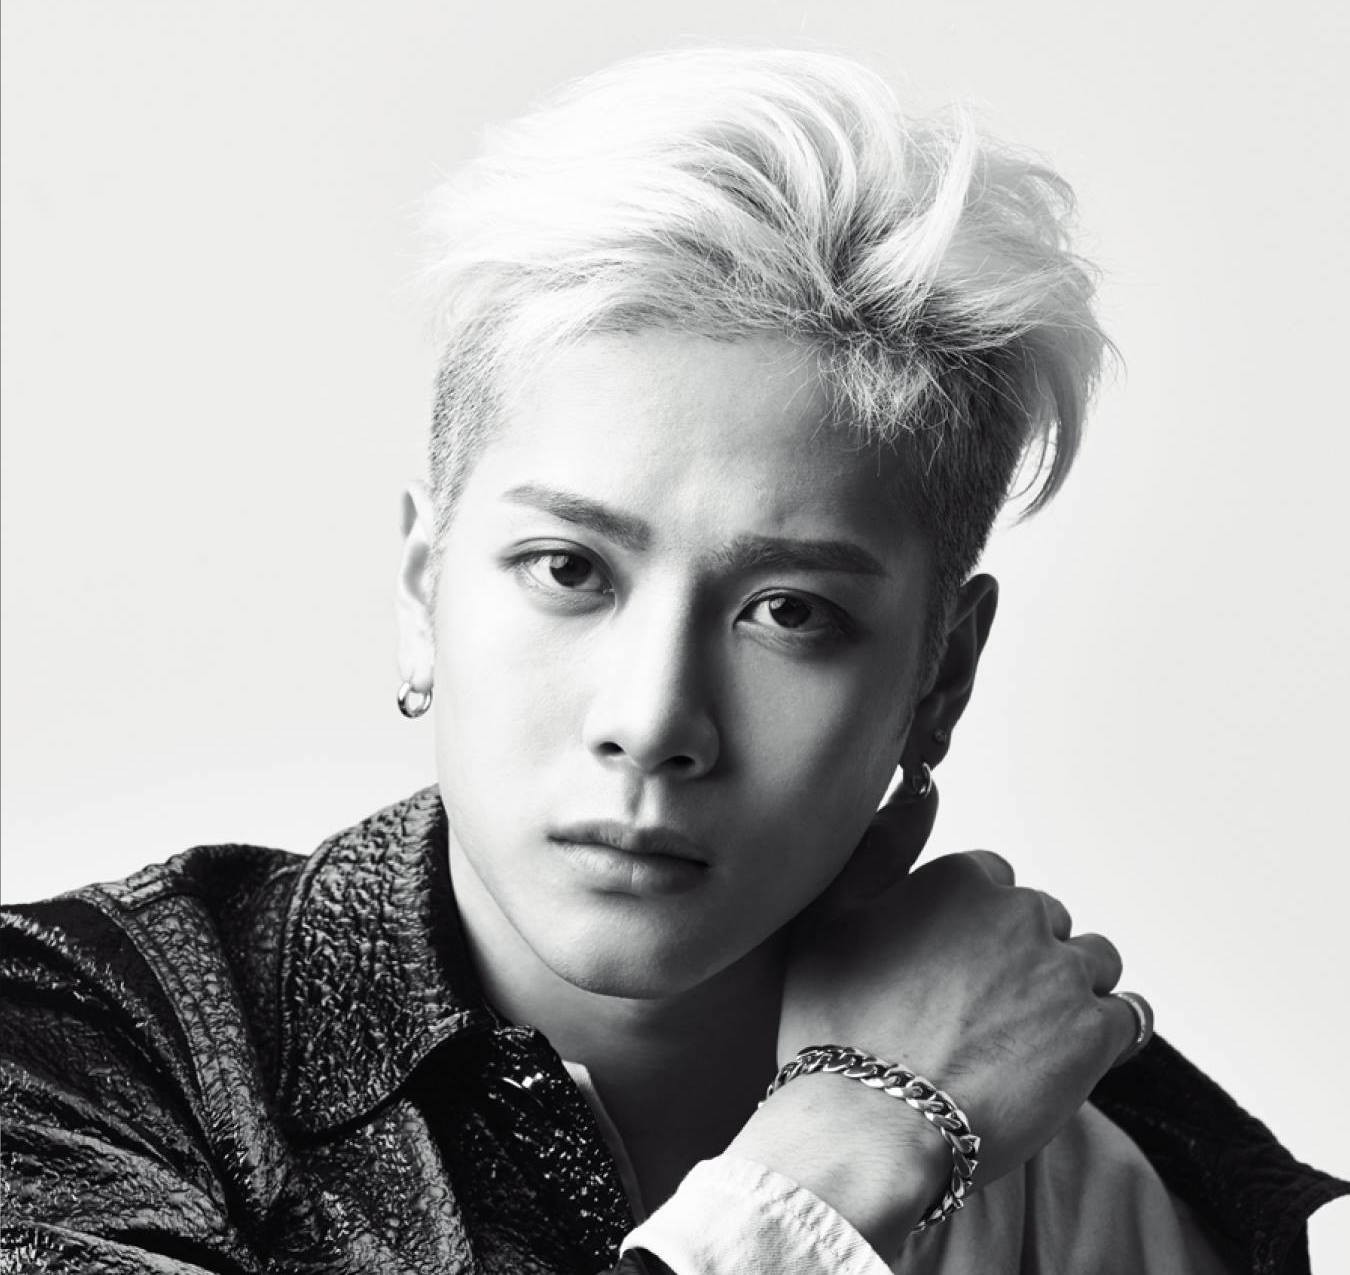 Se revela que Jackson de GOT7 descansará debido a problemas de salud